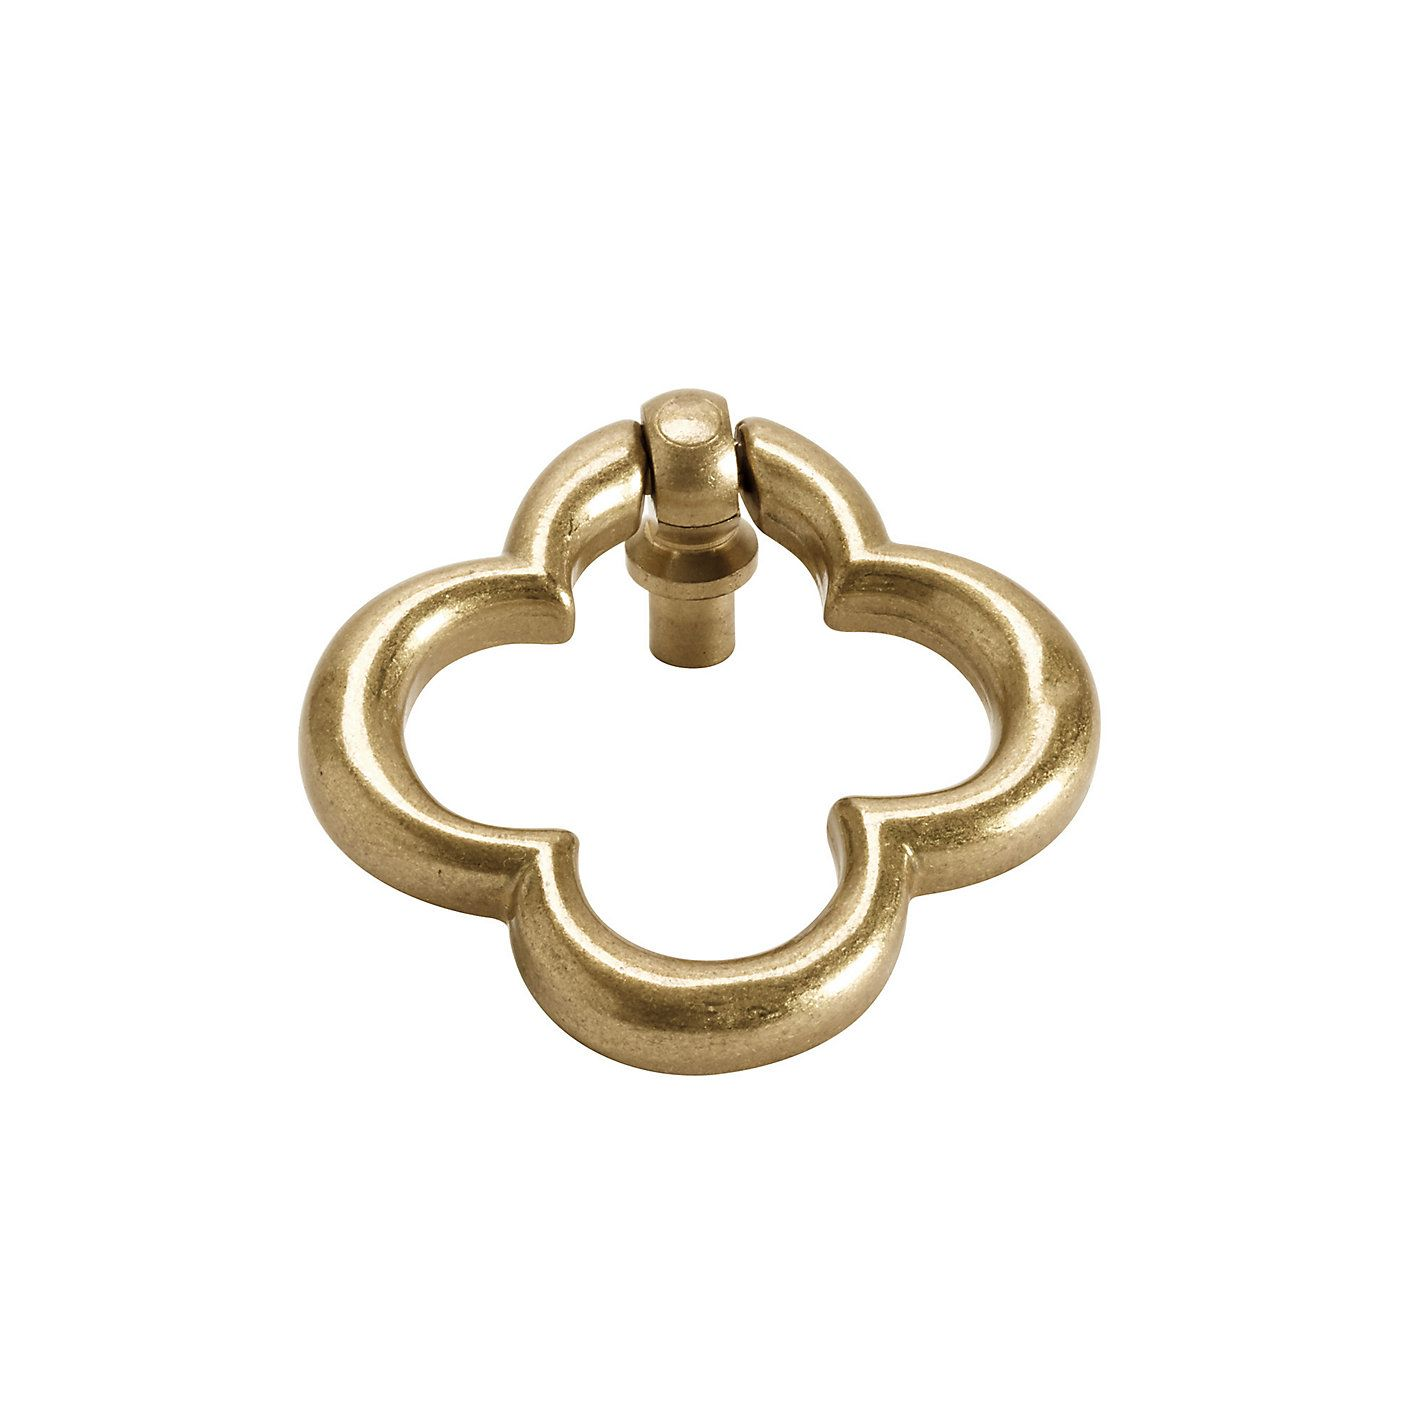 Vintage Brass Drop Pull Made in Spain Restoration Furniture Hardware